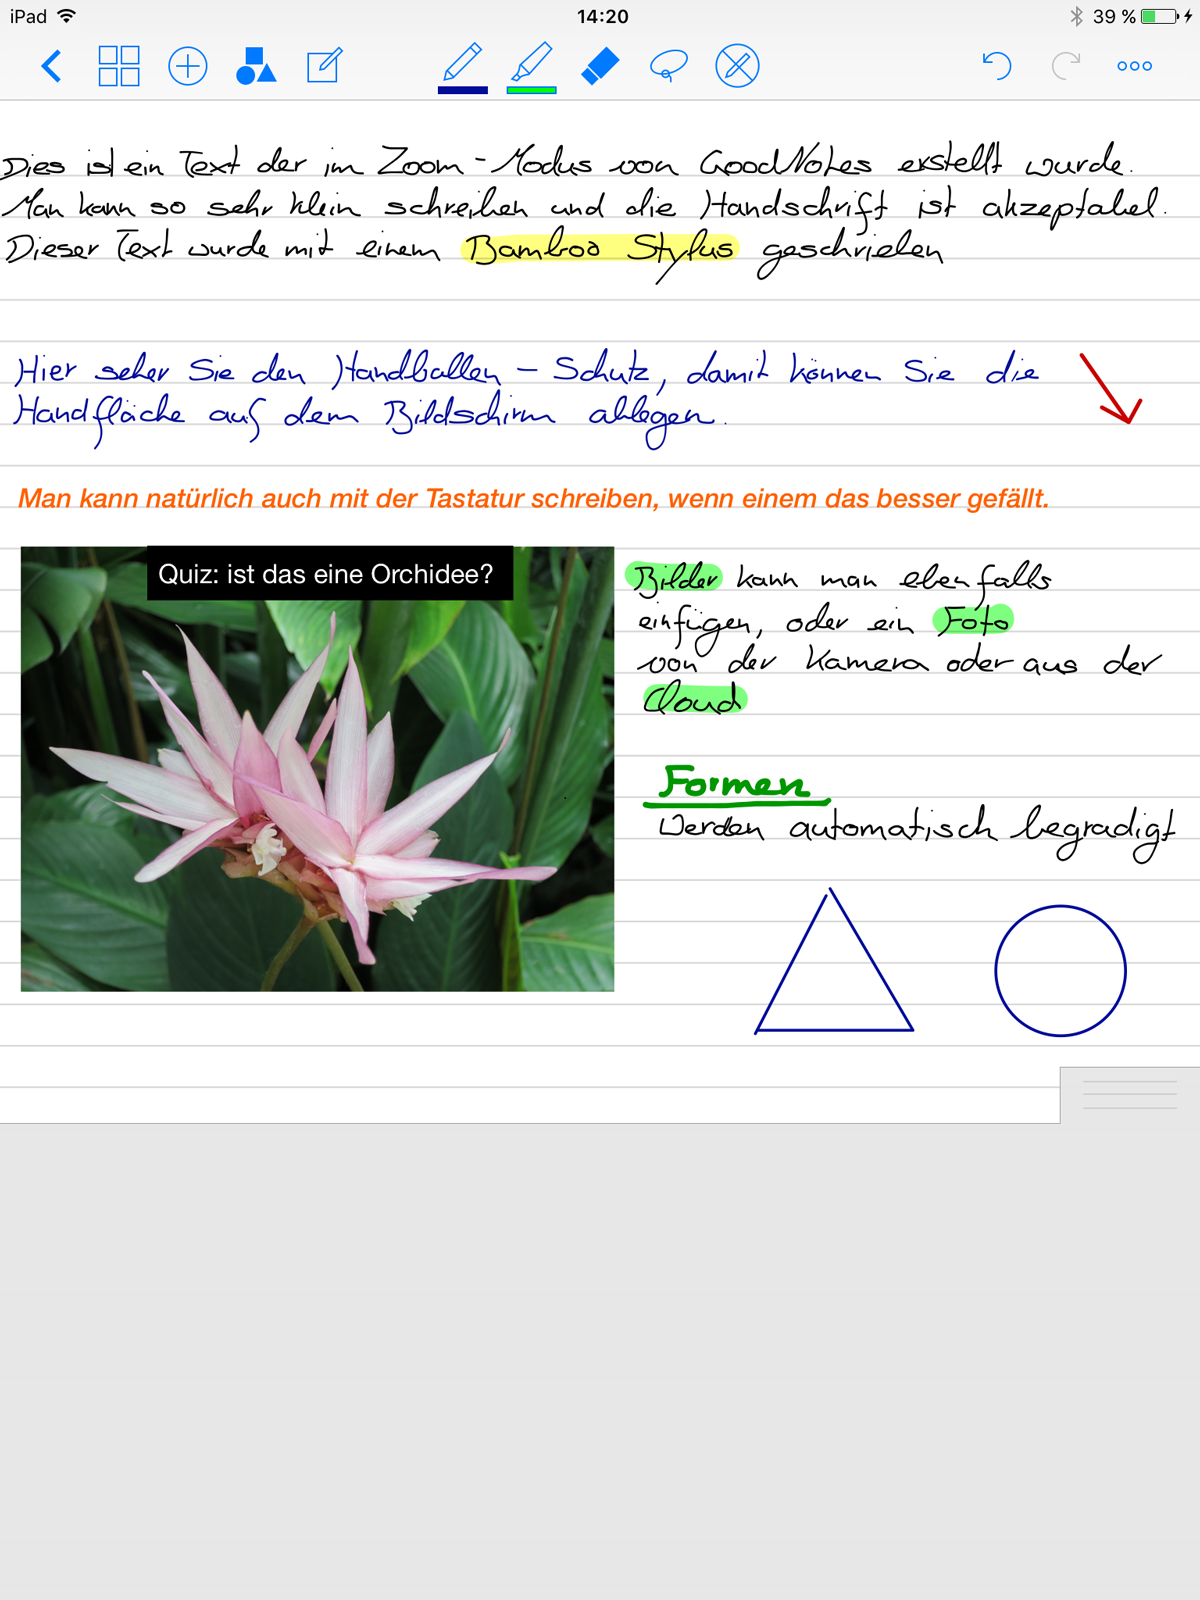 Notizen | Projektblog papierloses Studium